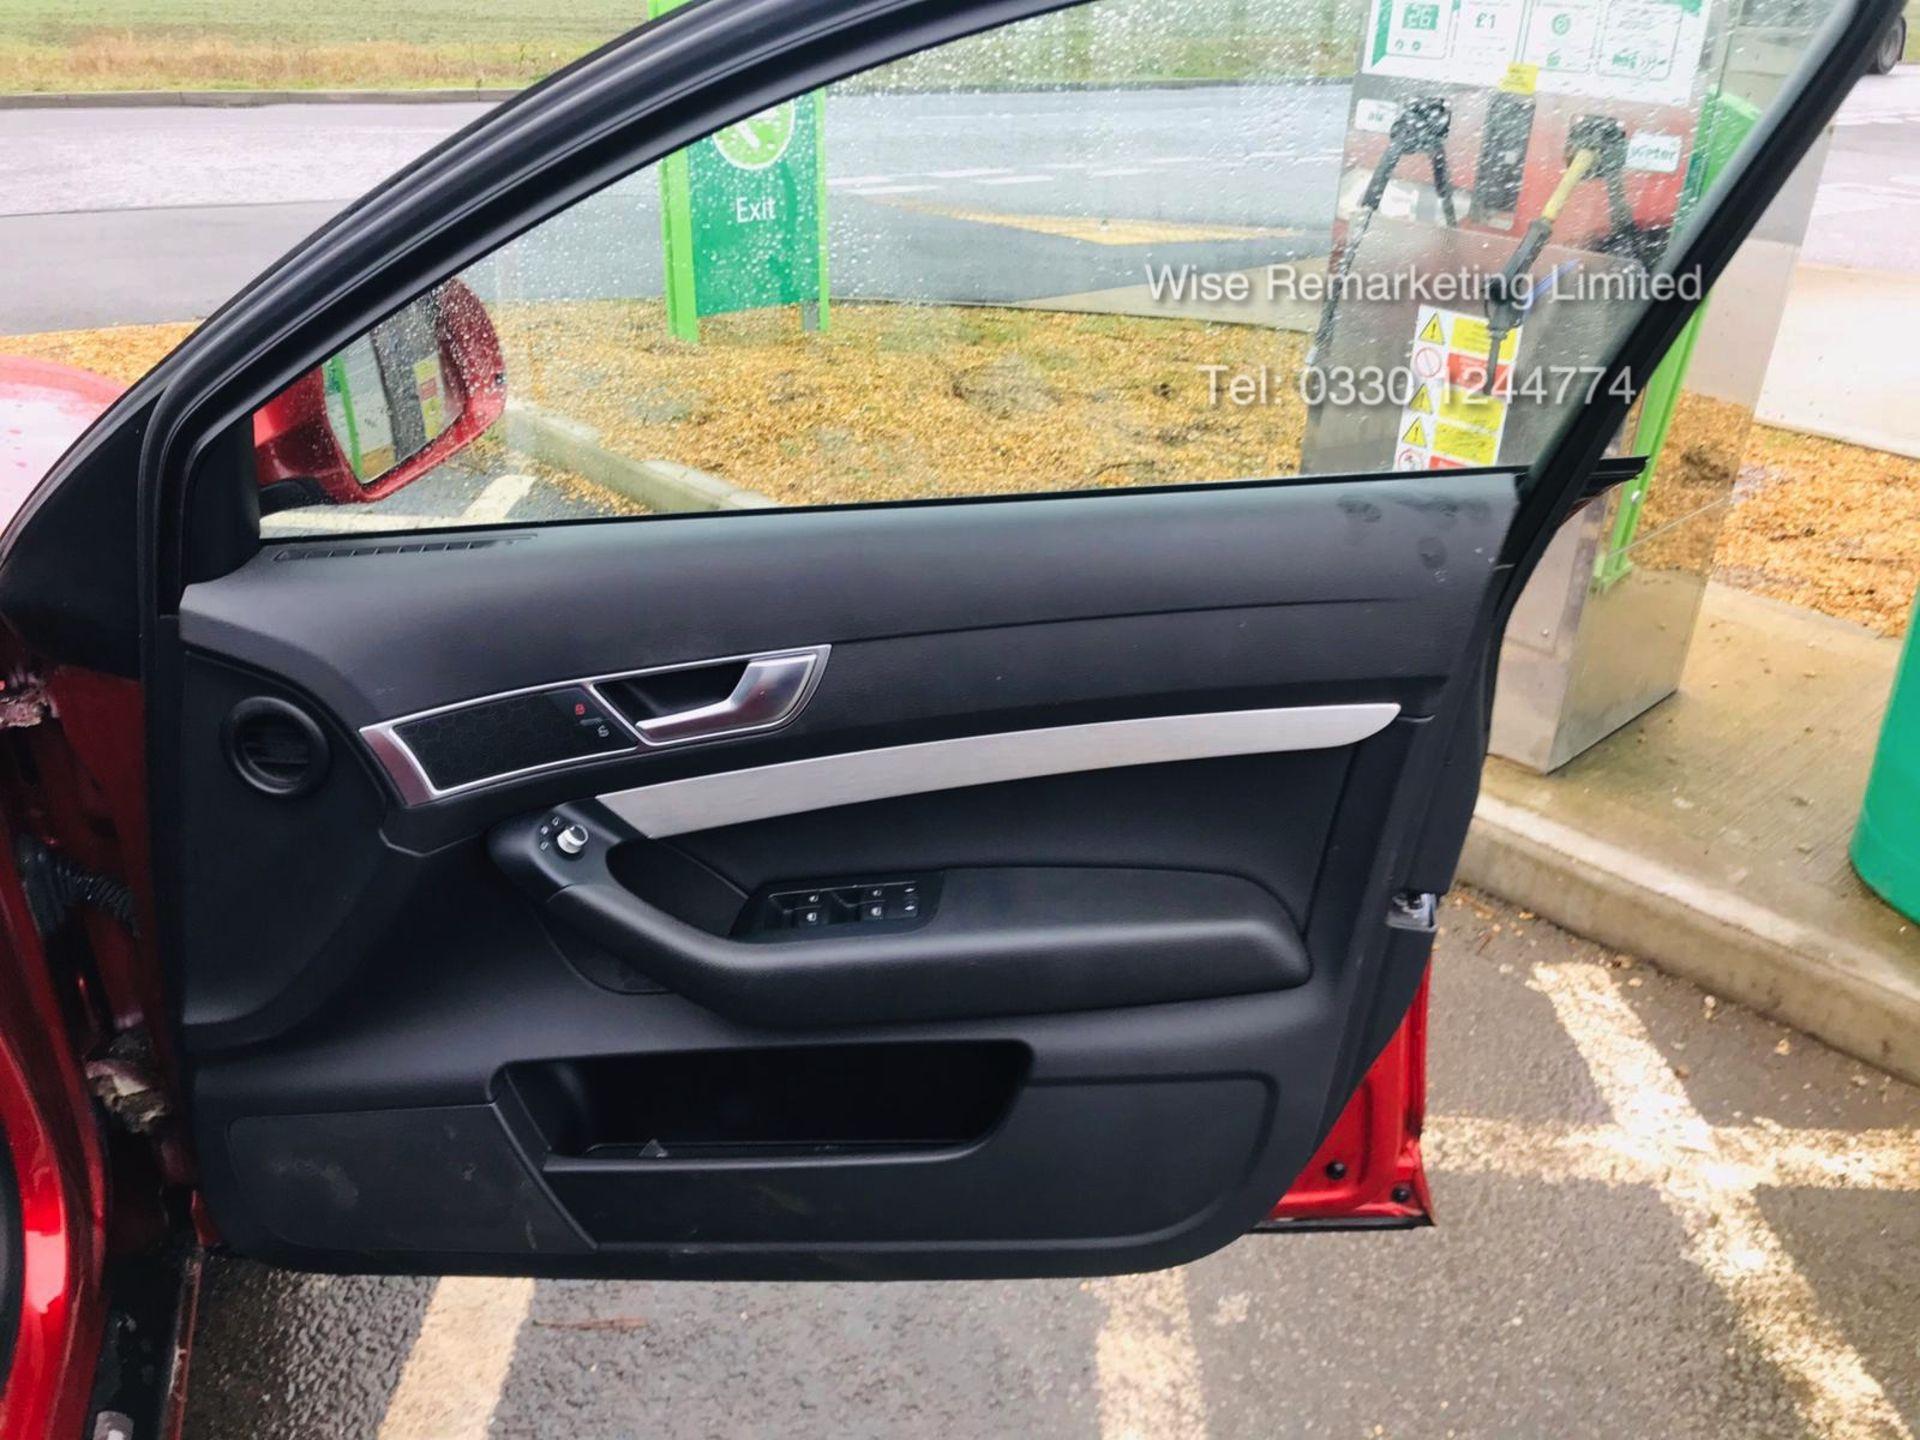 Lot 45 - Audi A6 2.0 TDI S Line - 2011 Model - Full leather - Sat Nav